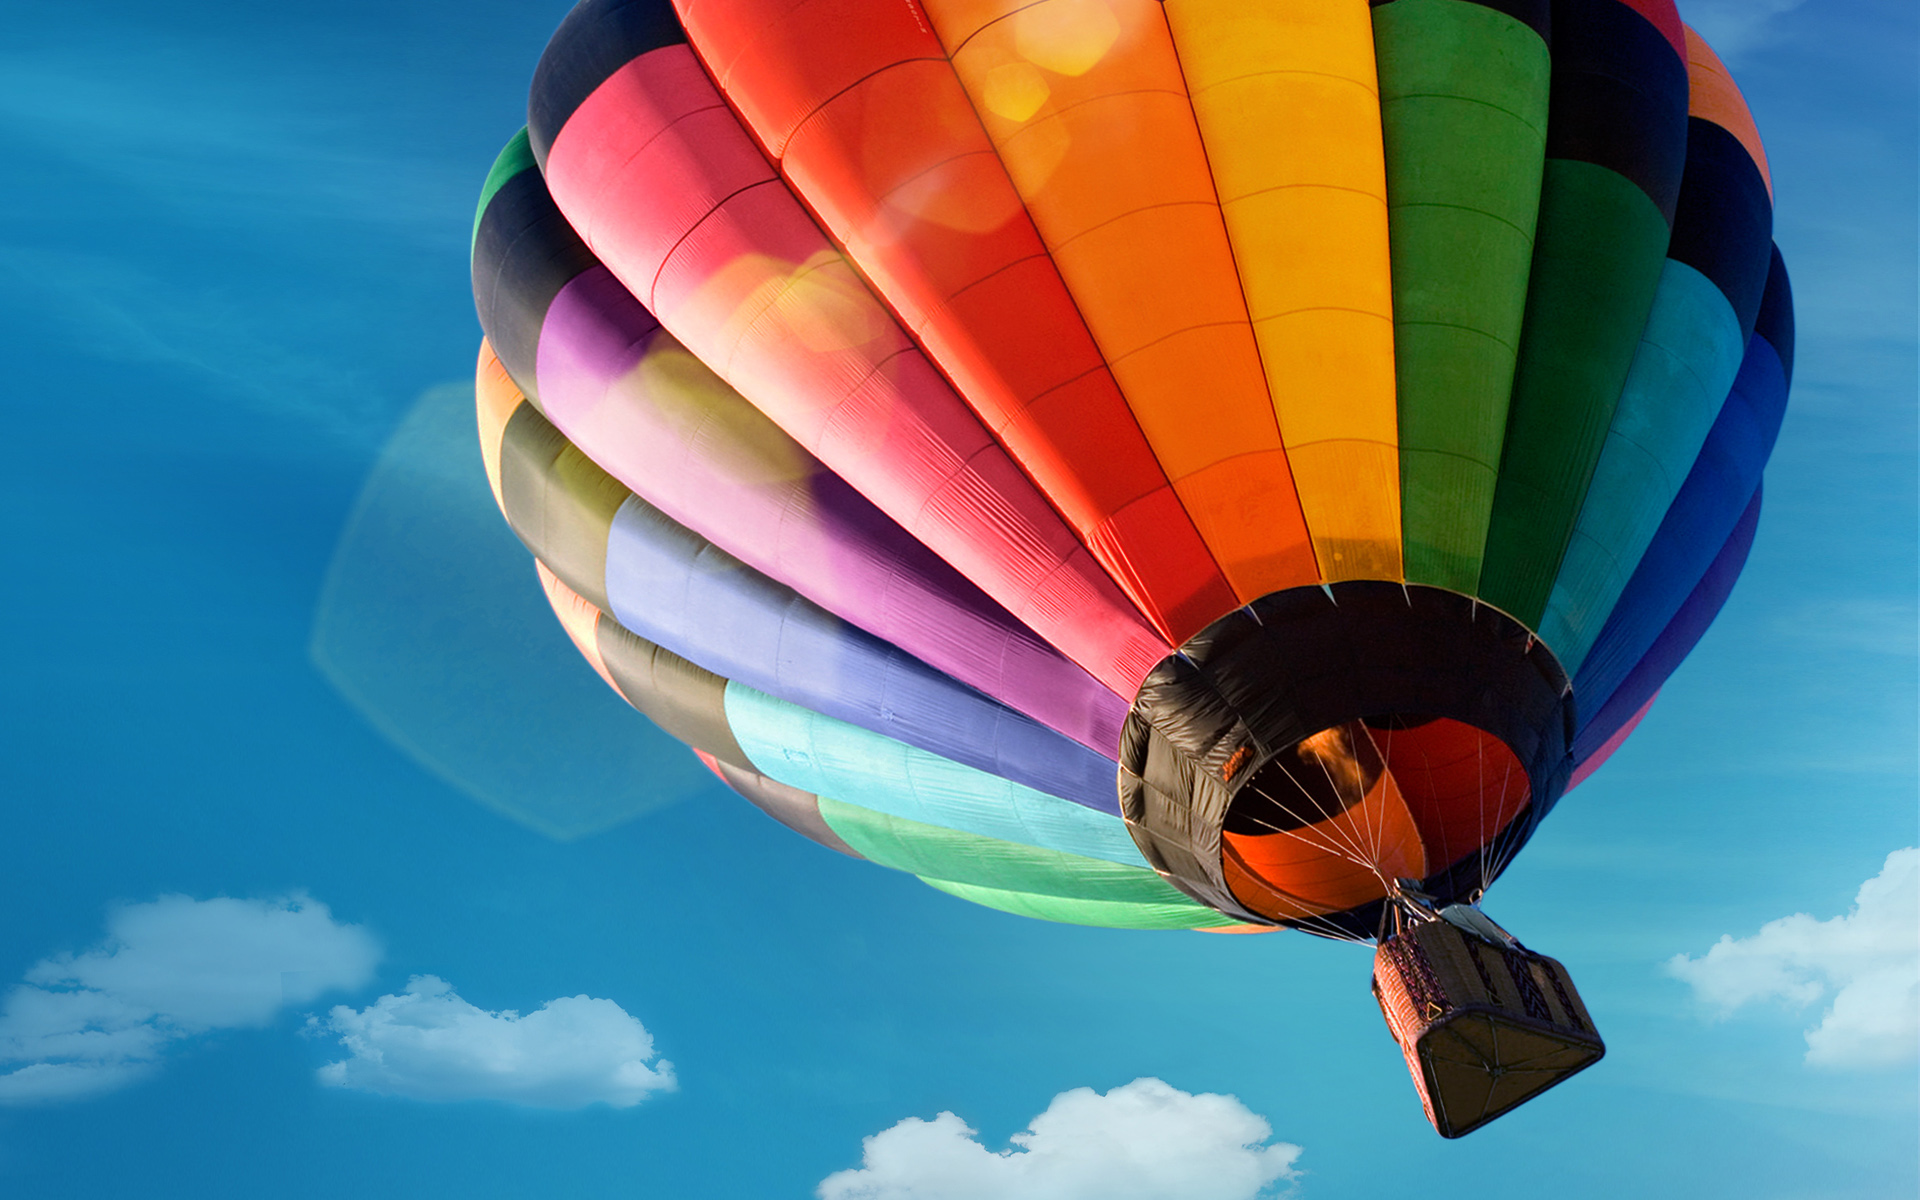 Colorfyl Hot Air Balloon Wallpapers HD Wallpapers 1920x1200